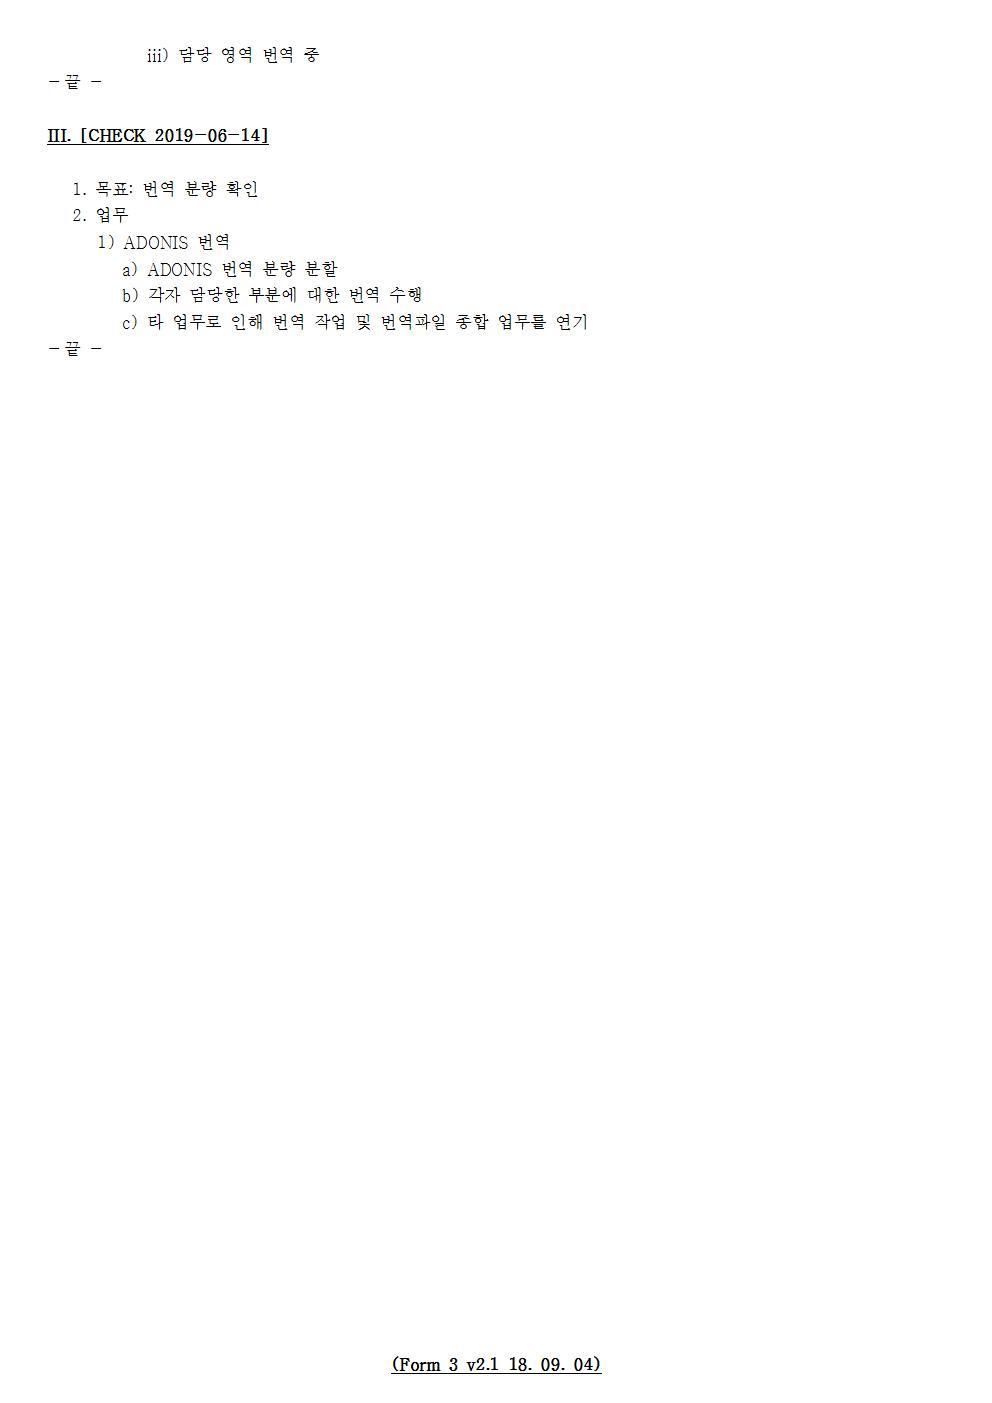 D-[19-033-BZ-05]-[ADONIS Translation]-[2019-06-14][YB]-[19-6-2]-[P+D+C]002.jpg